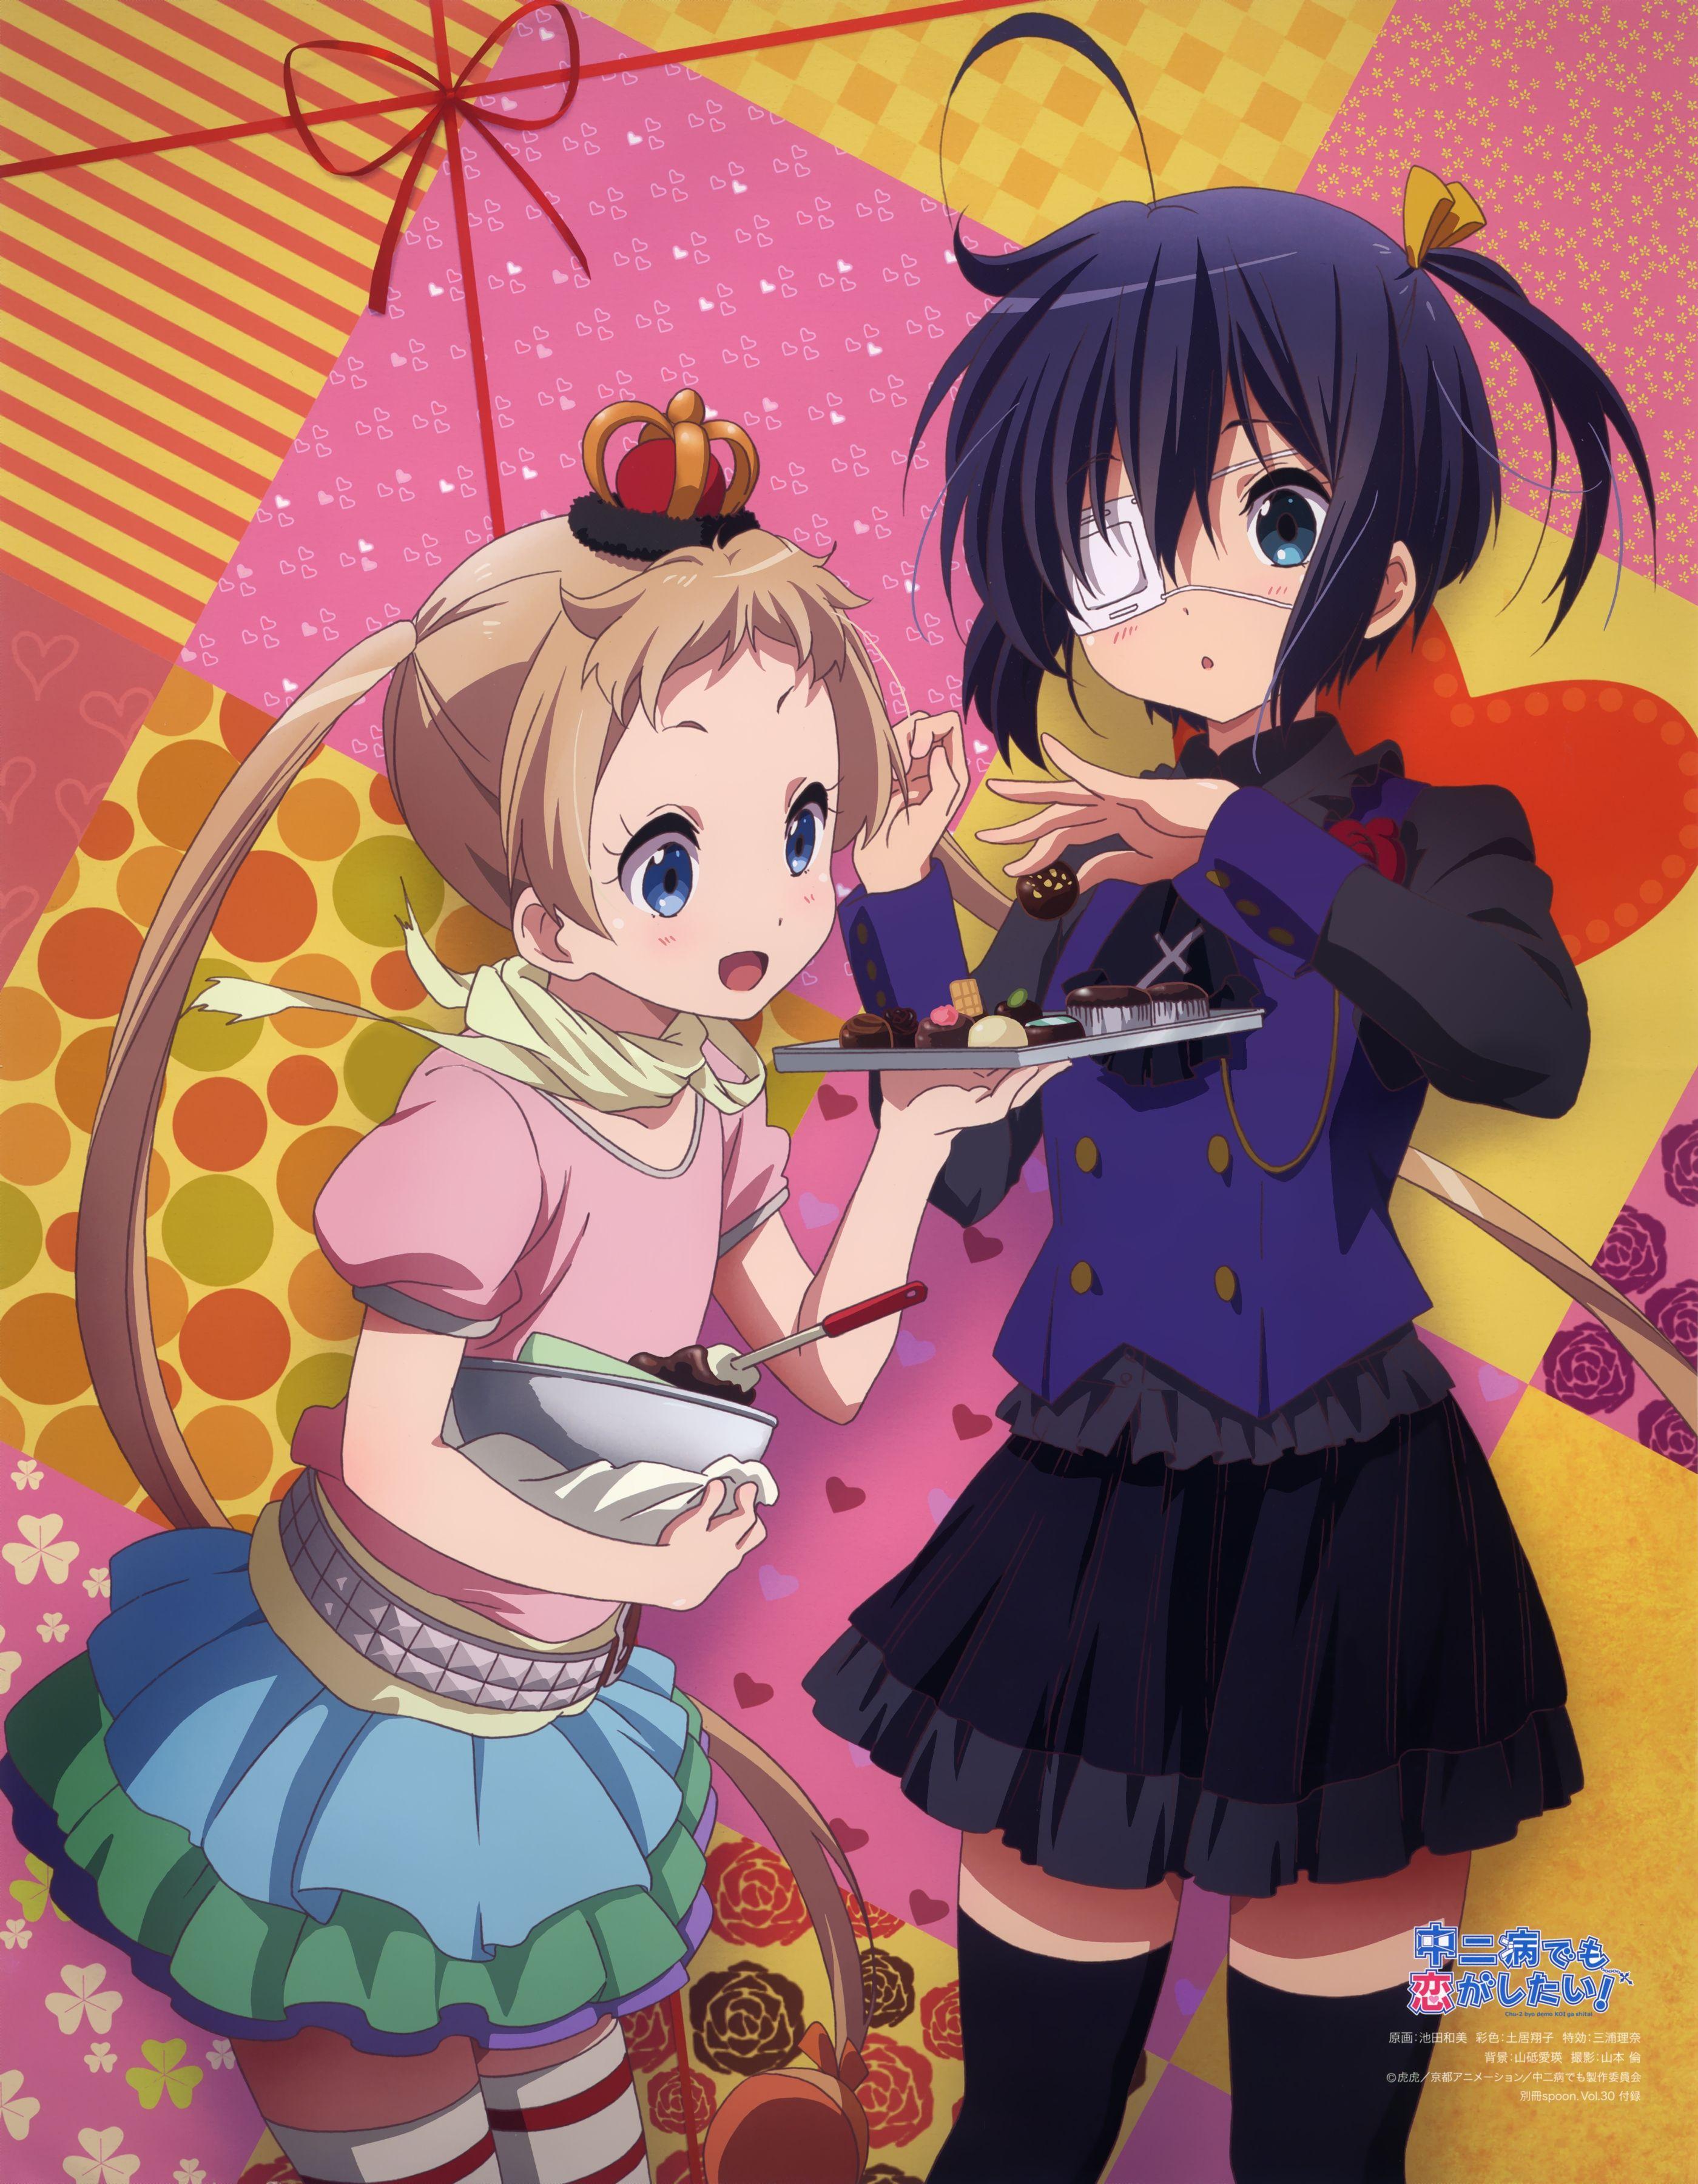 Dekomori Sanae & Takanashi Rika Anime, Anime characters